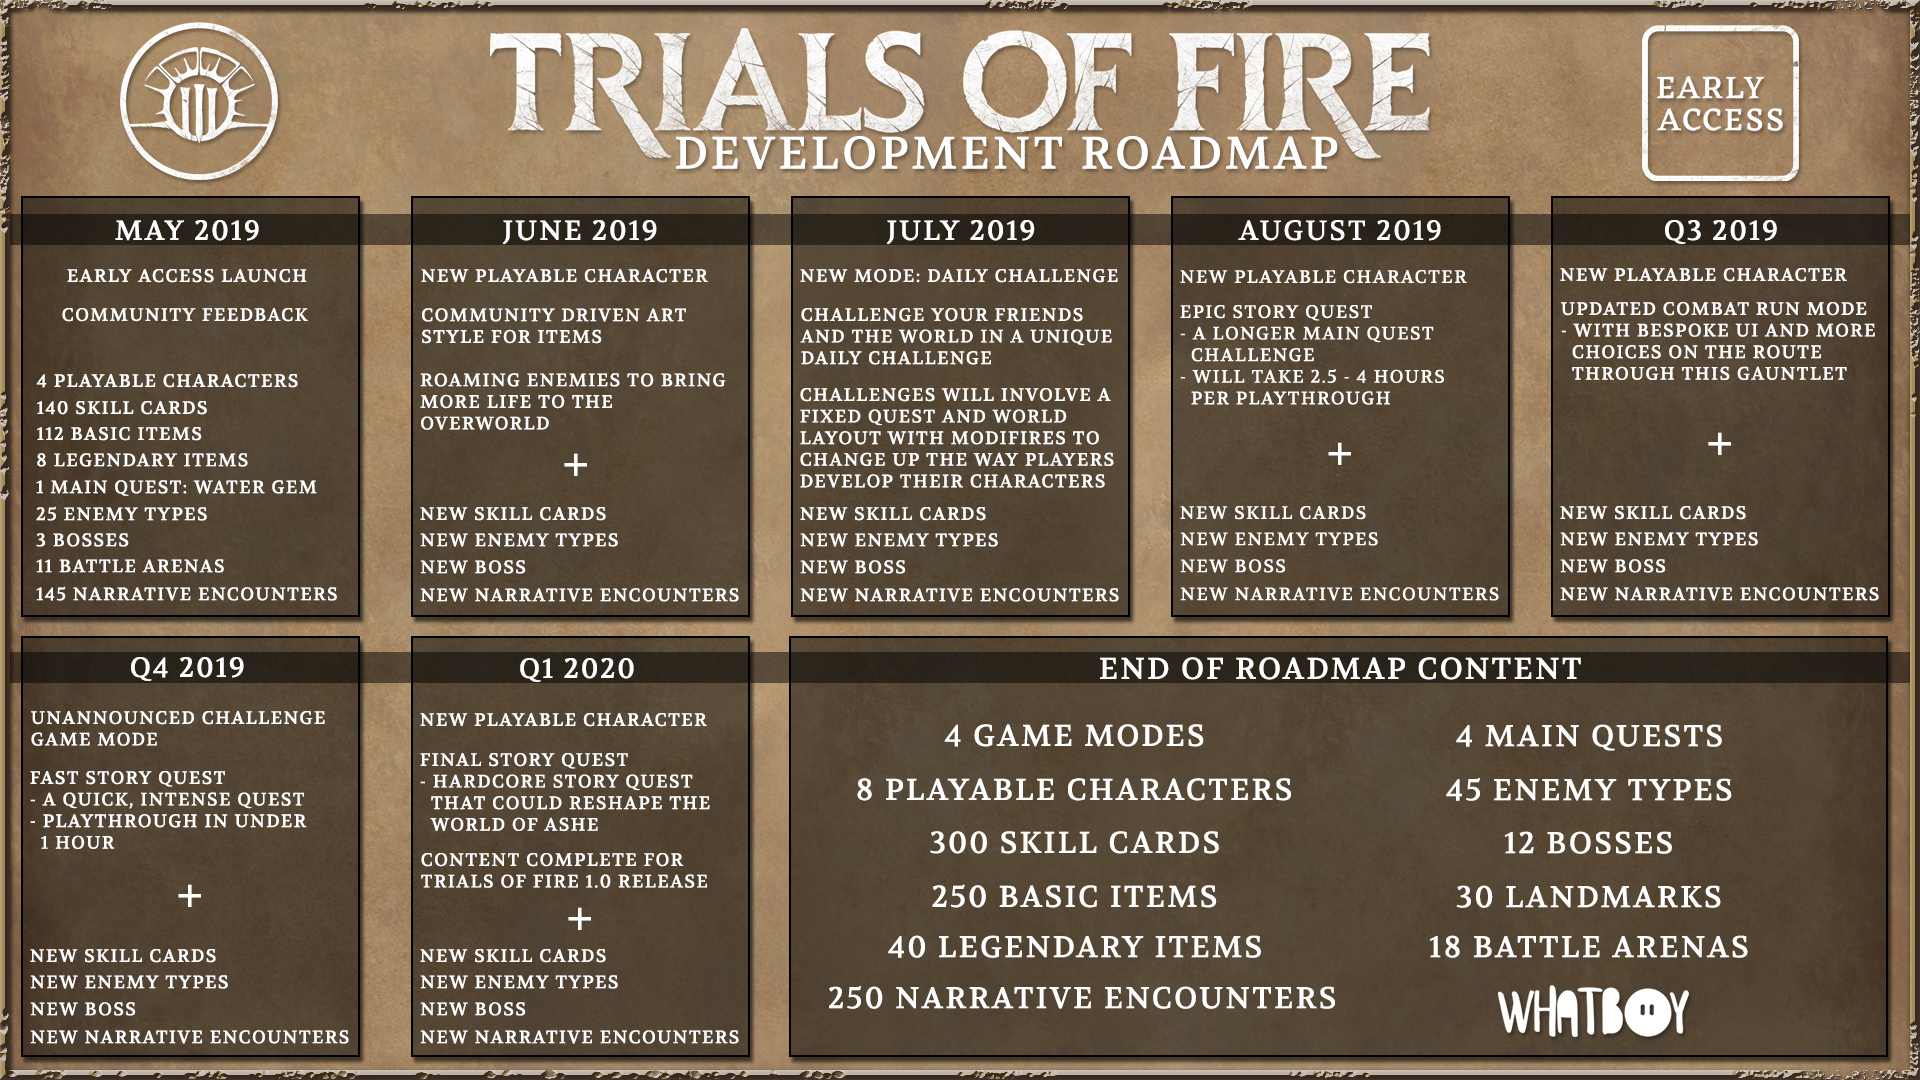 Jun 10 New Playable Character: Alchemist Trials of Fire